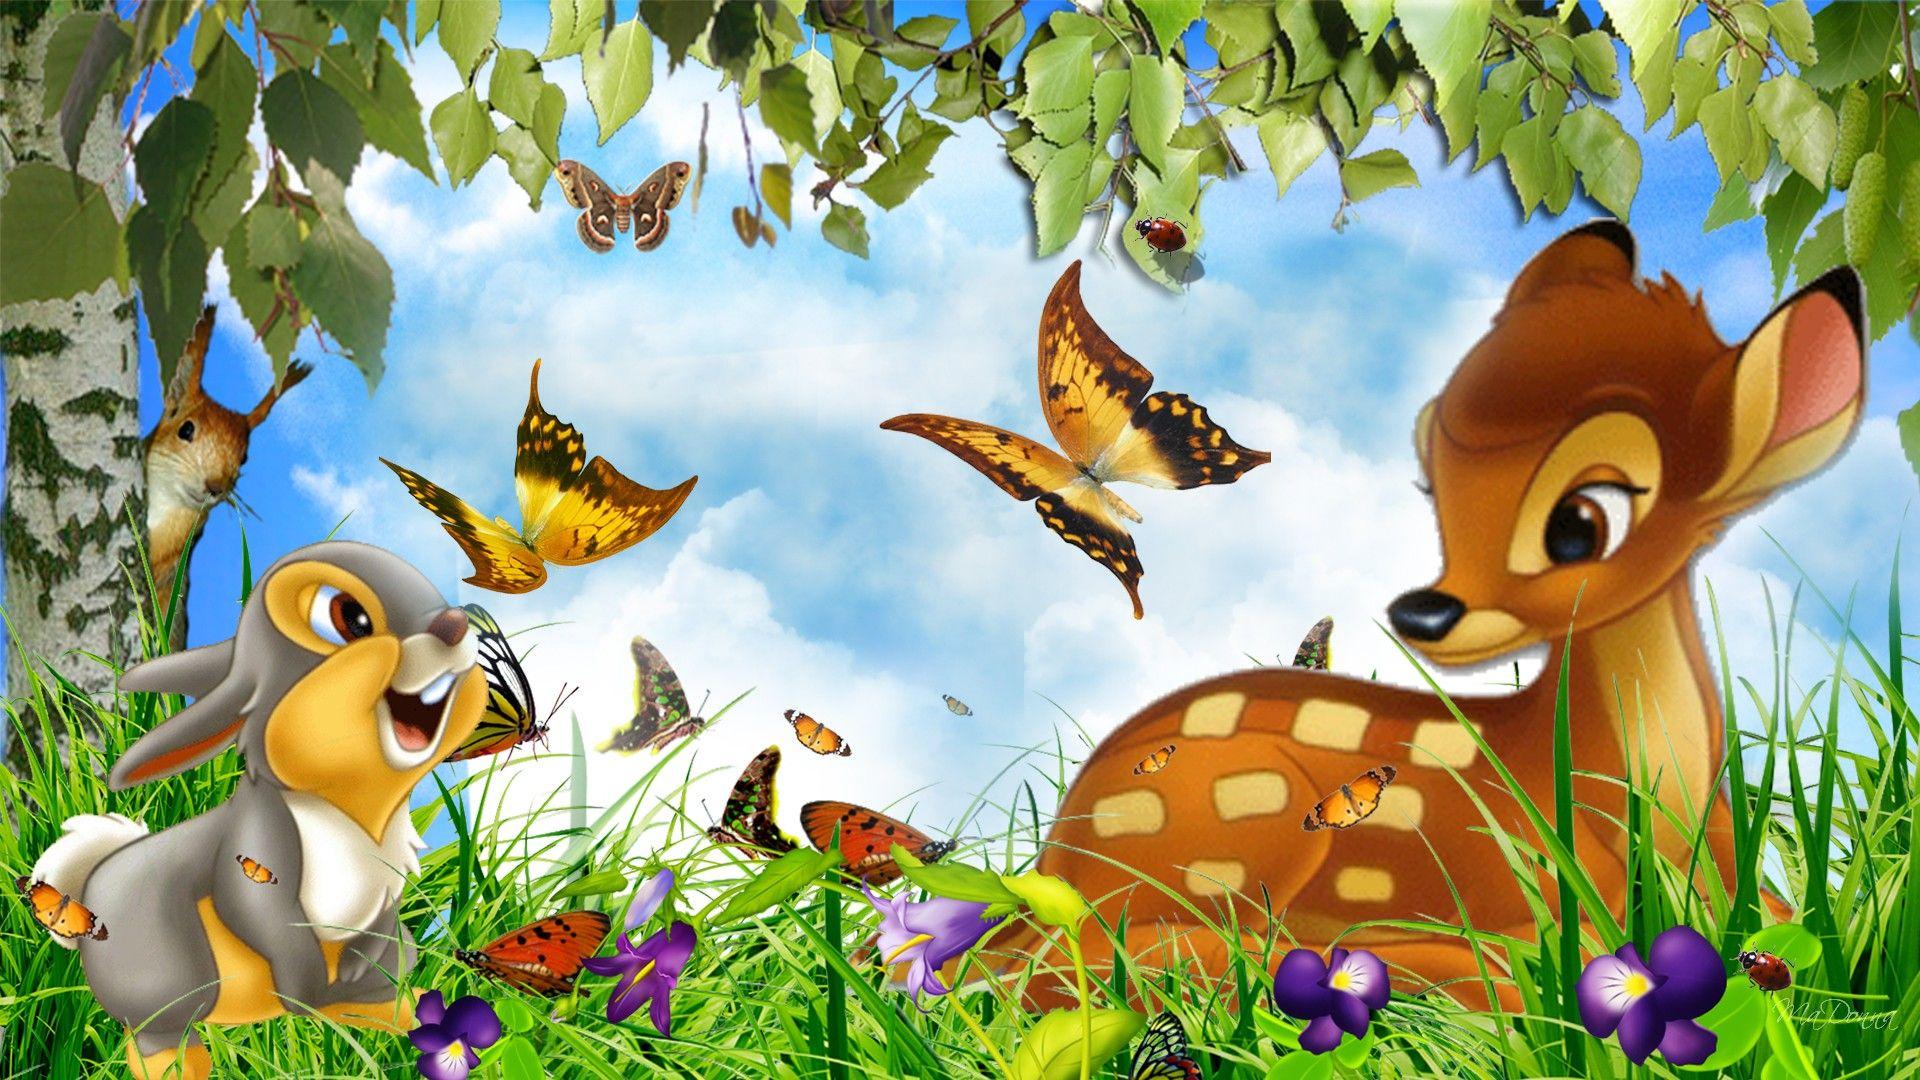 Bunnies and butterflies Wallpapers Benny Gold Thumper